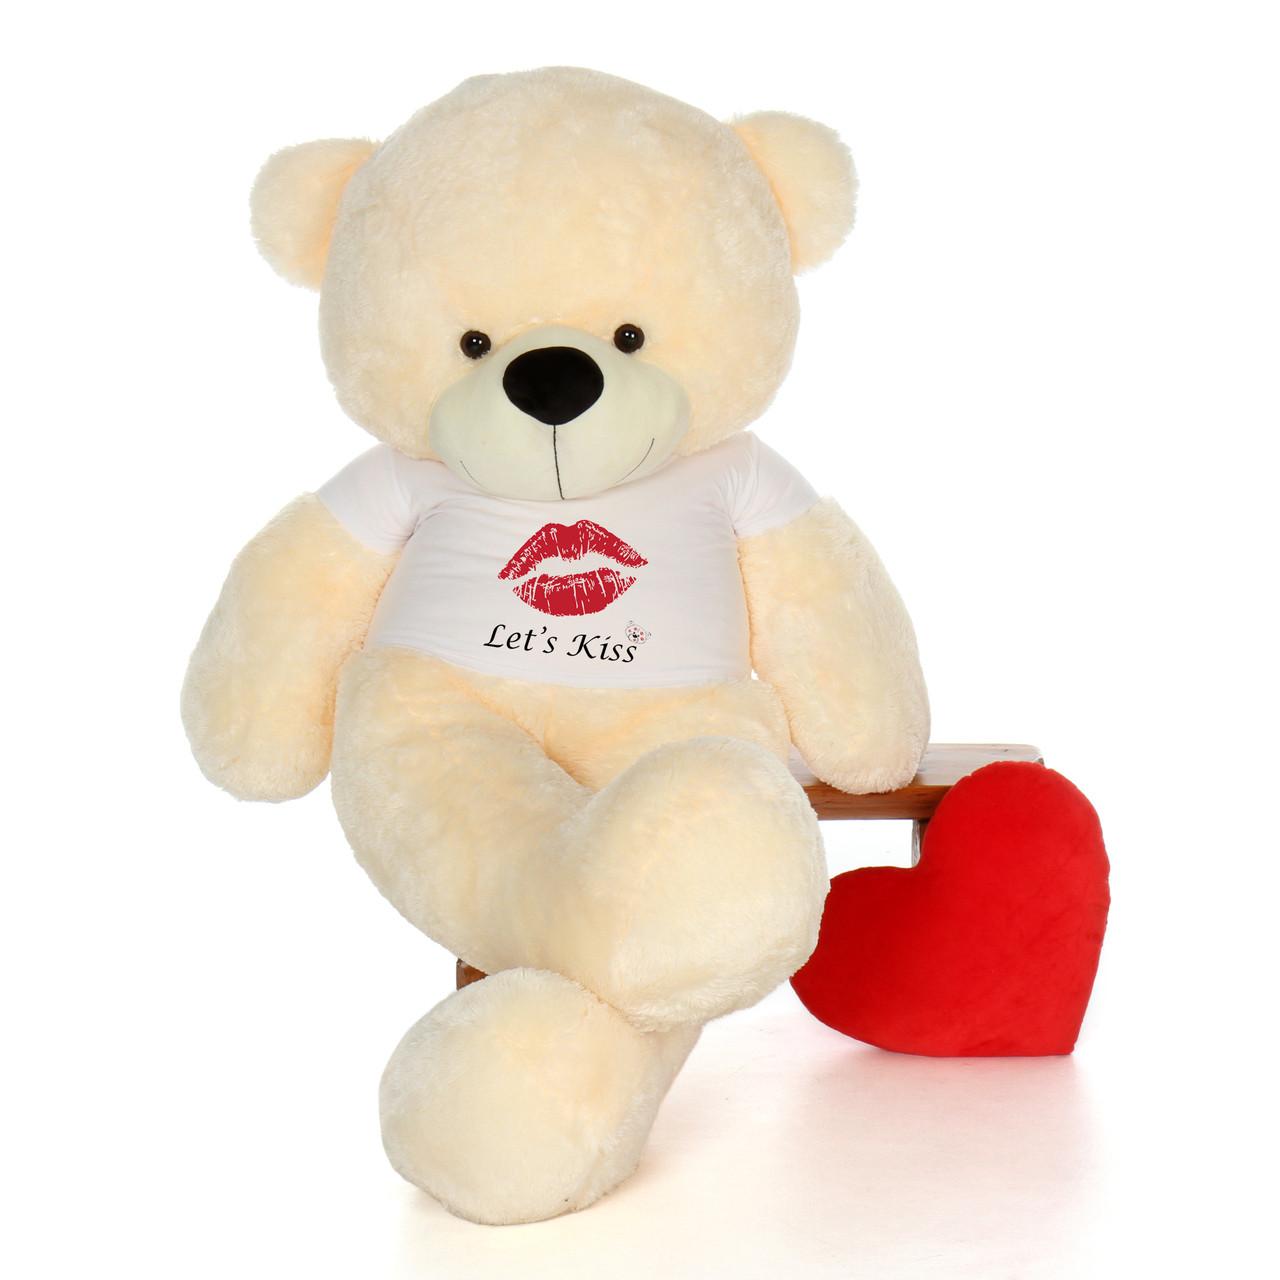 6ft Cozy Cuddles Vanilla Giant Teddy Bear in Let's Kiss T-Shirt